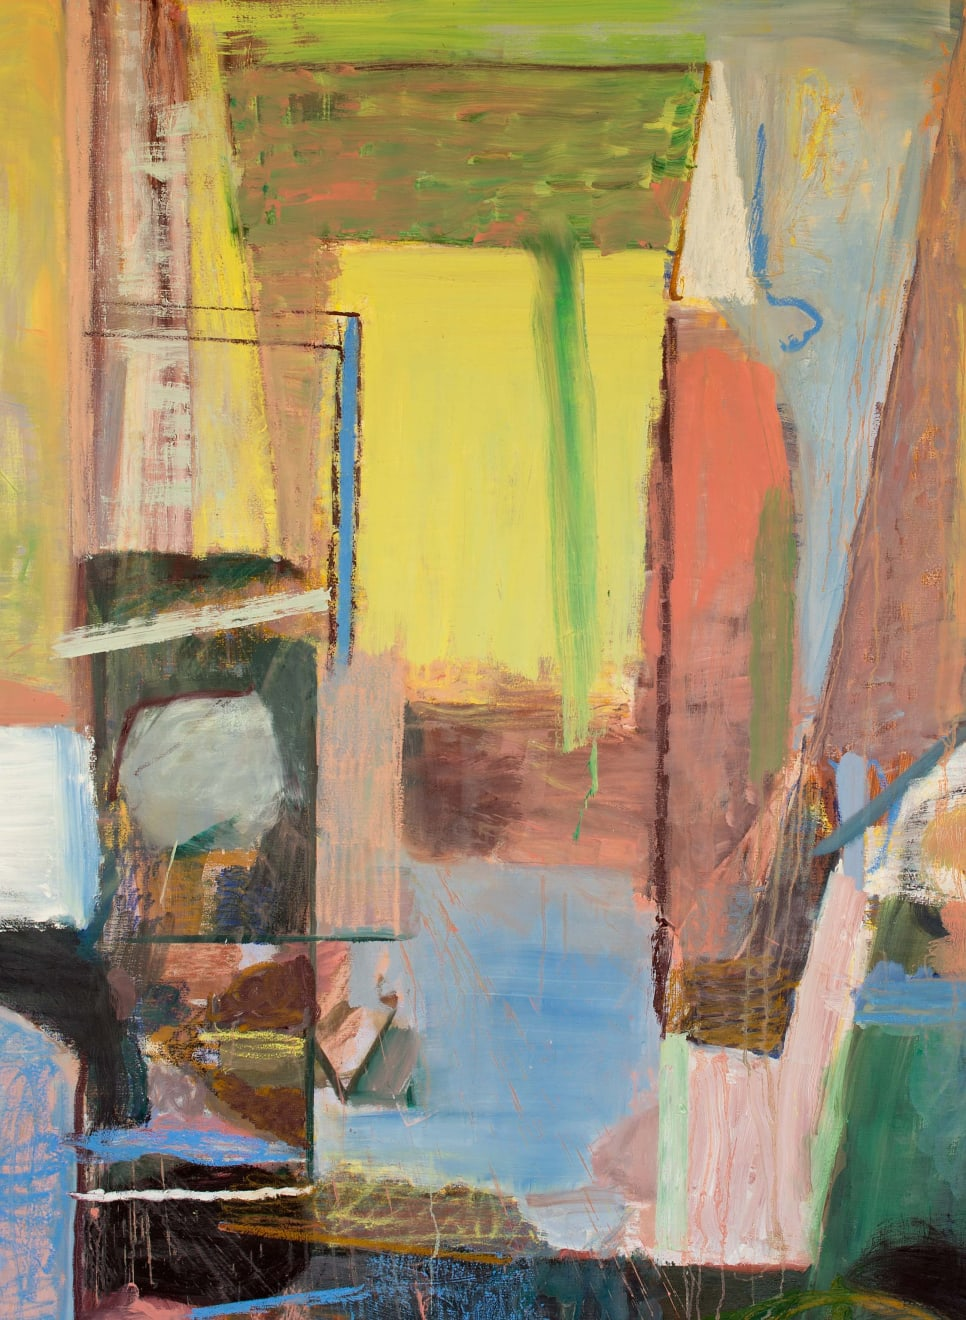 Breekwerk Oil Paint and Oil Crayon on Canvas Original 128 x 174 cm $13 100 £6 650